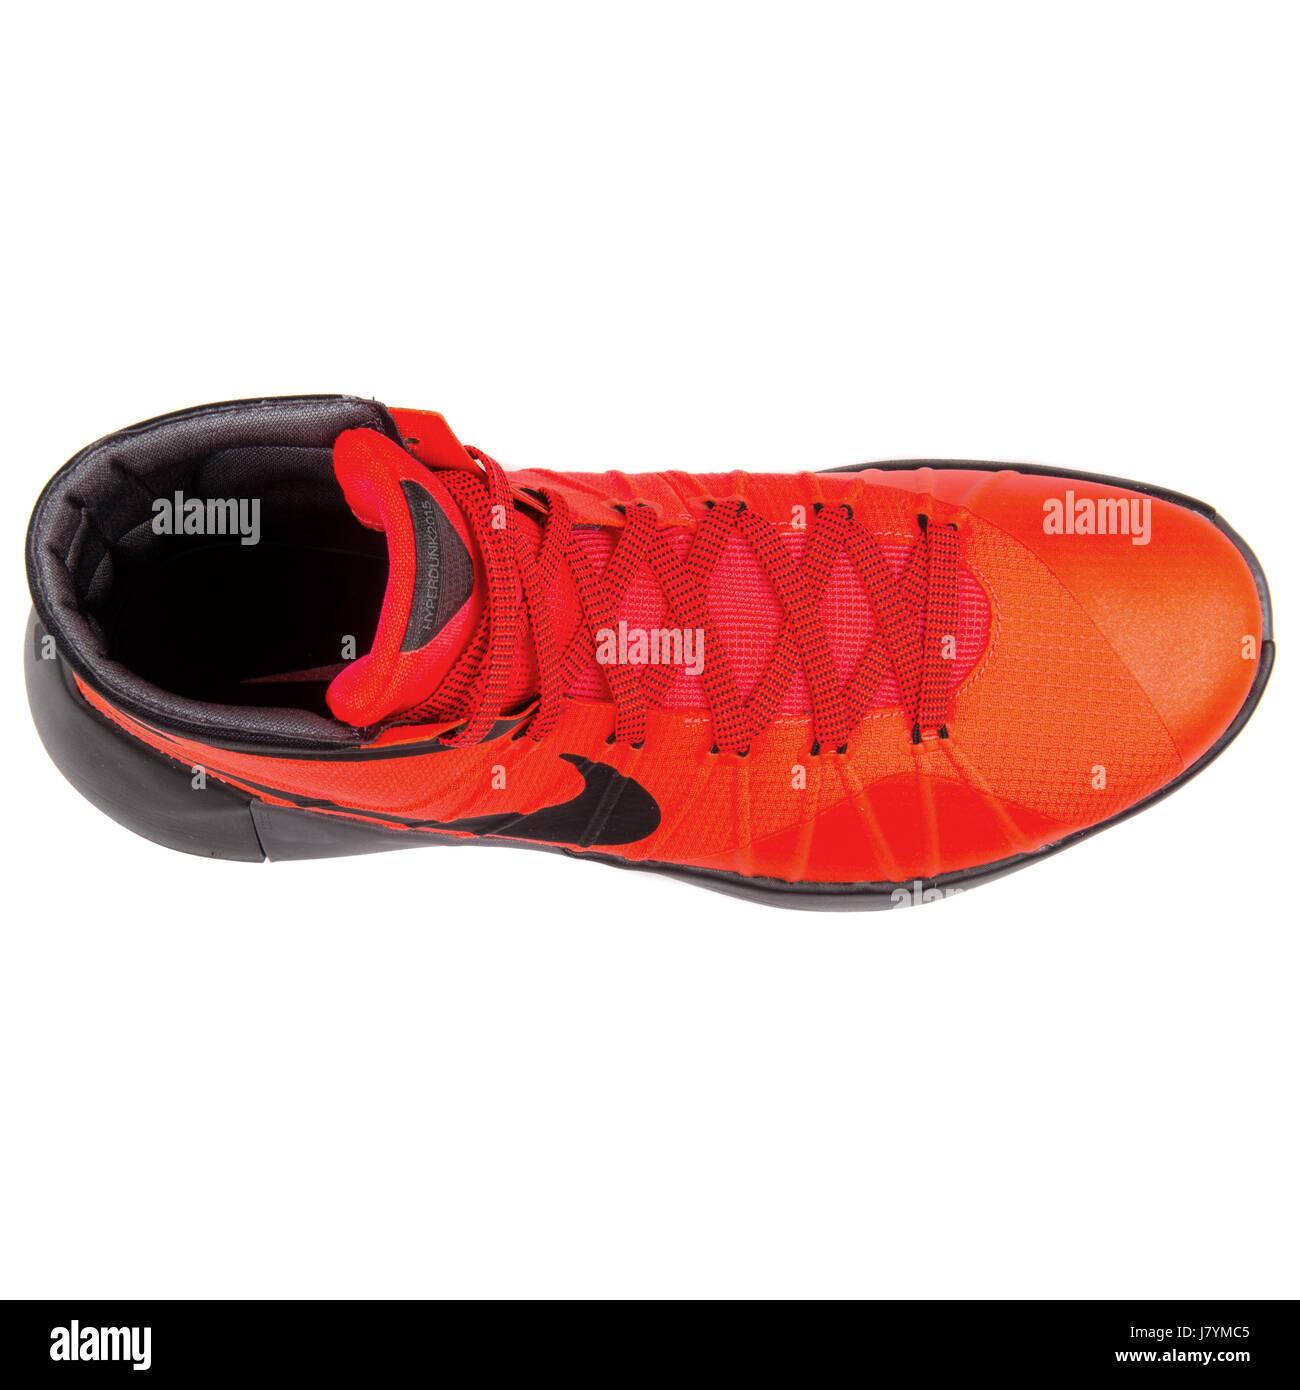 Nike Hyperdunk 2014. Rojo Naranja Spain | Zapatillas